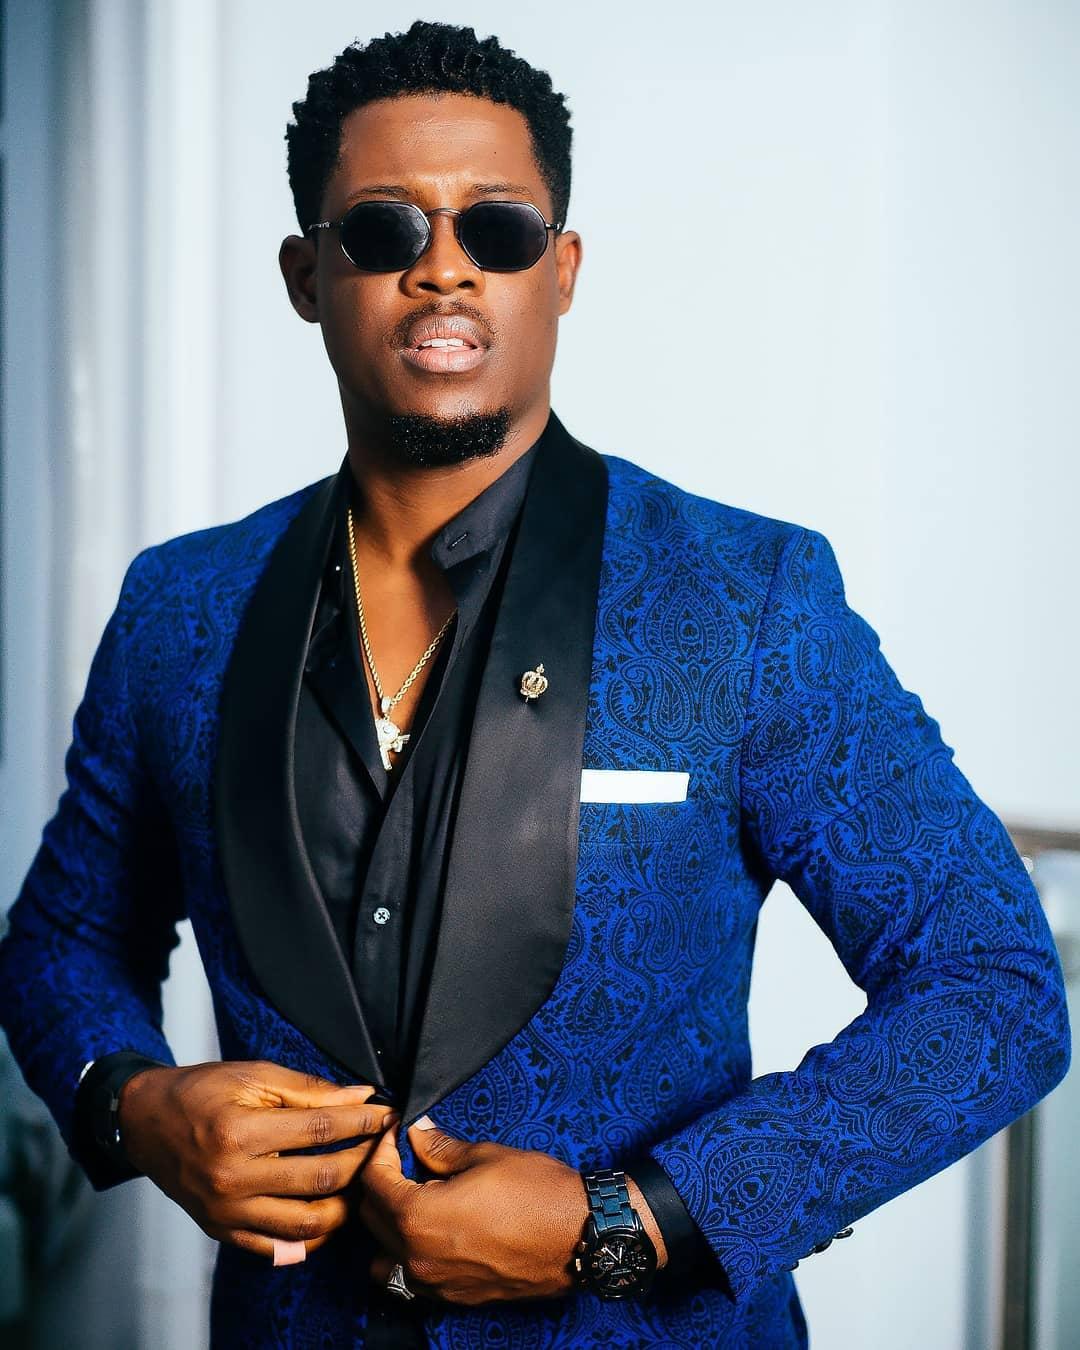 Seyi Awolowo tells his fans how Stars DO